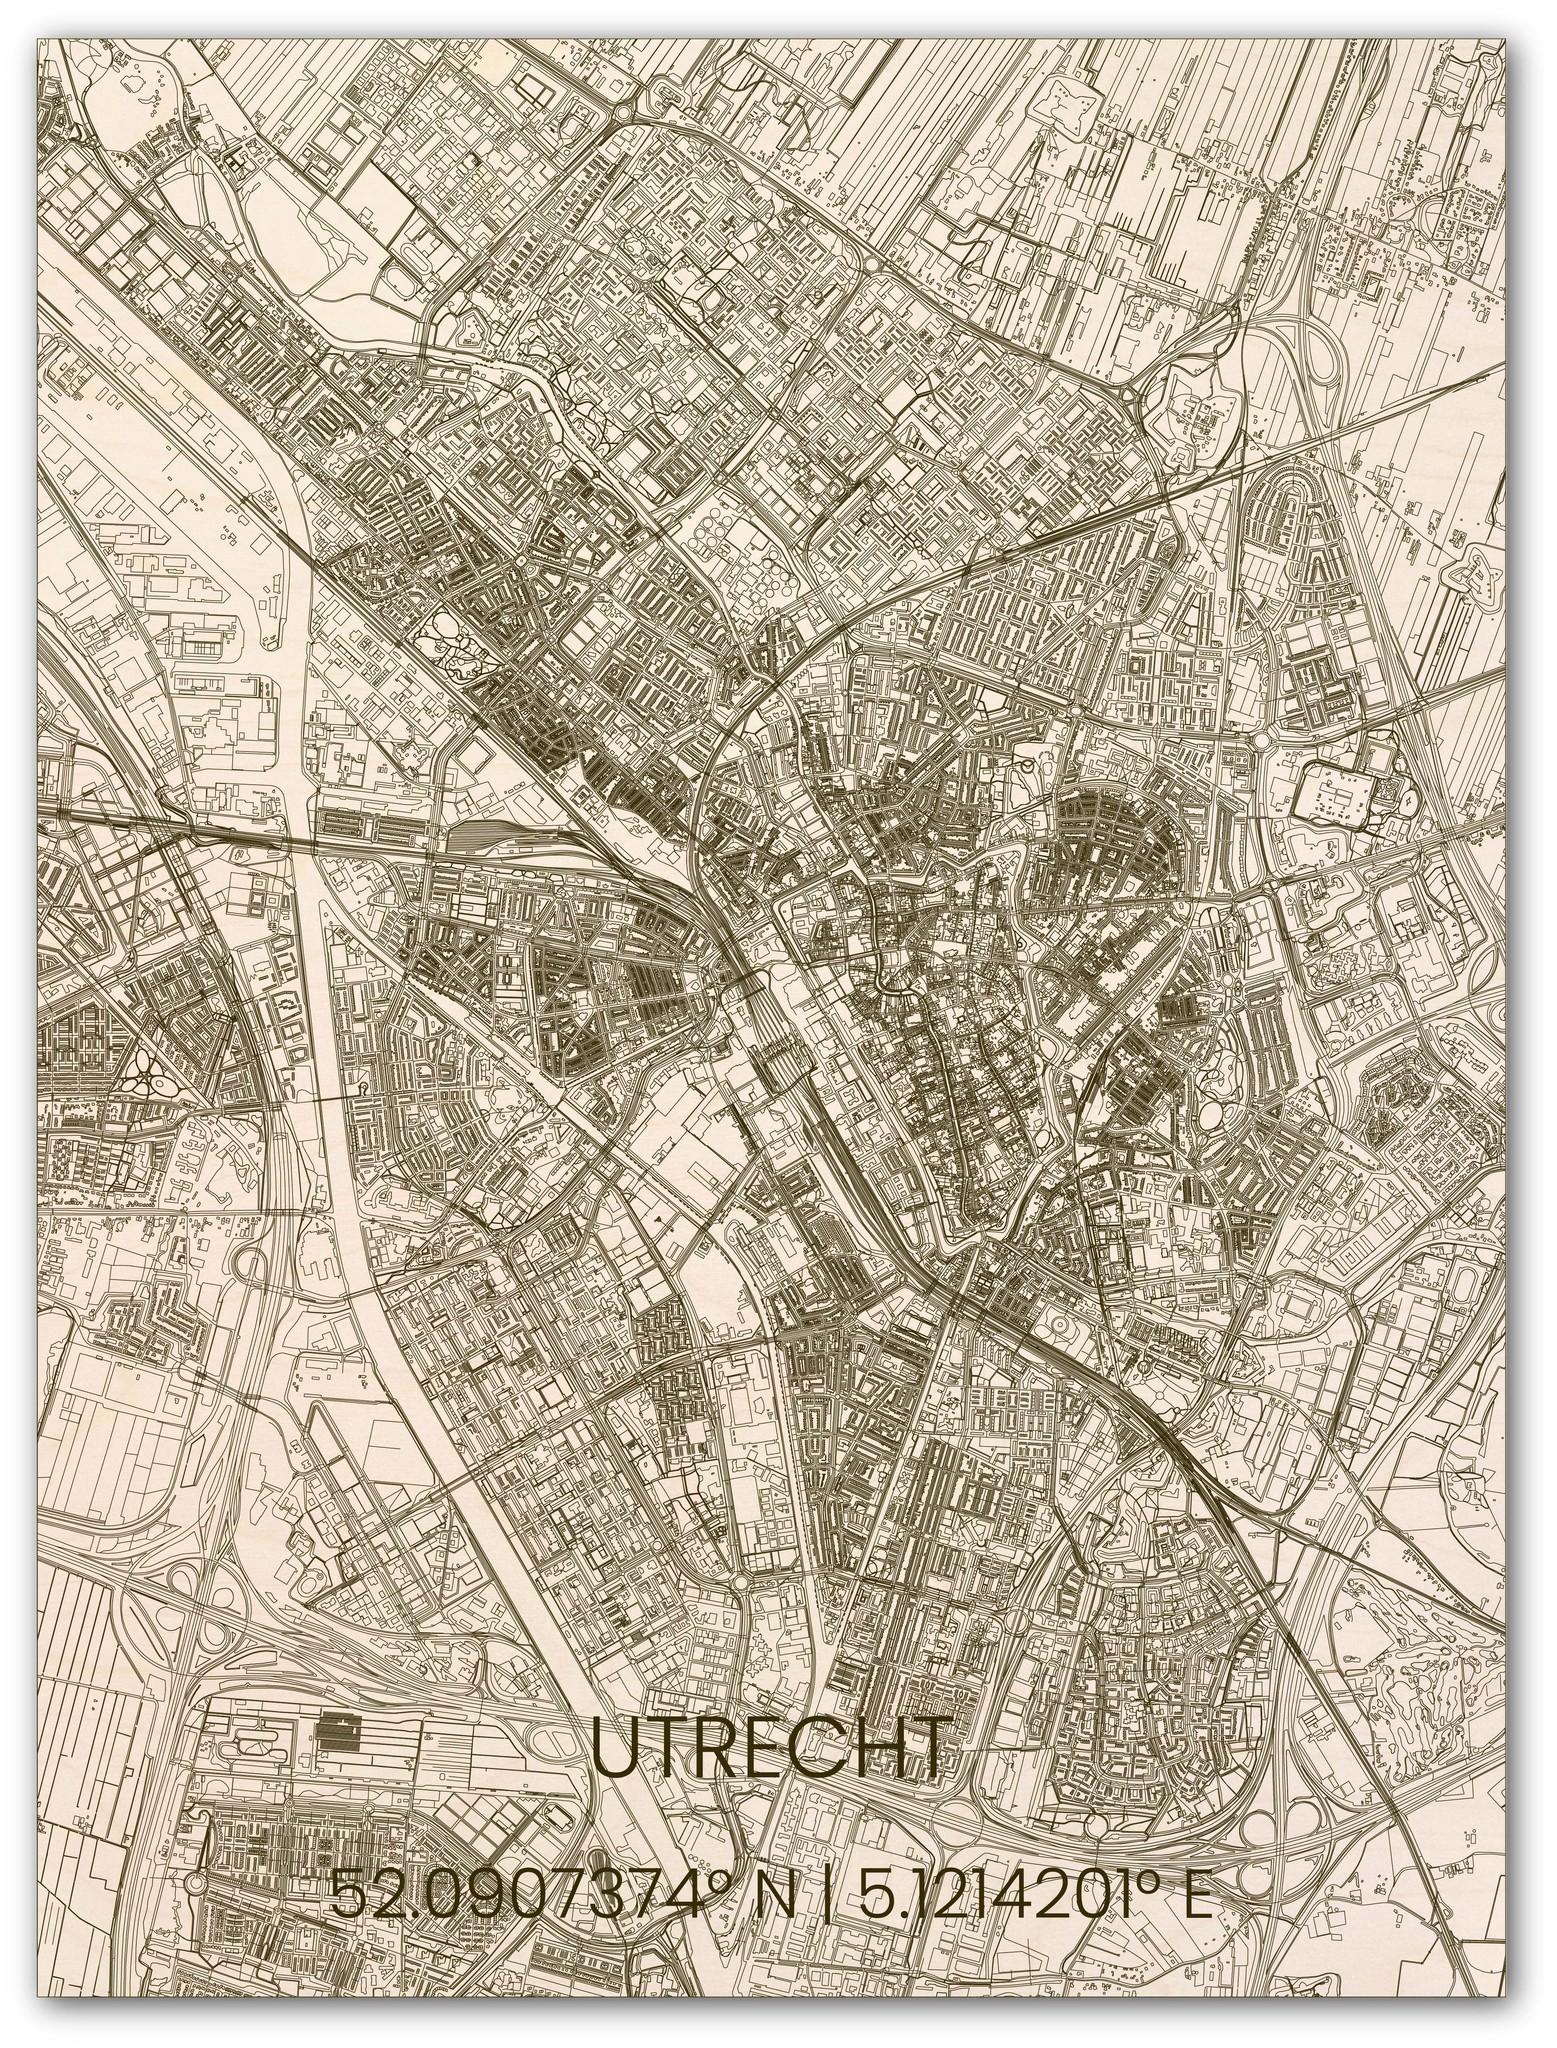 Houten stadsplattegrond Utrecht-1